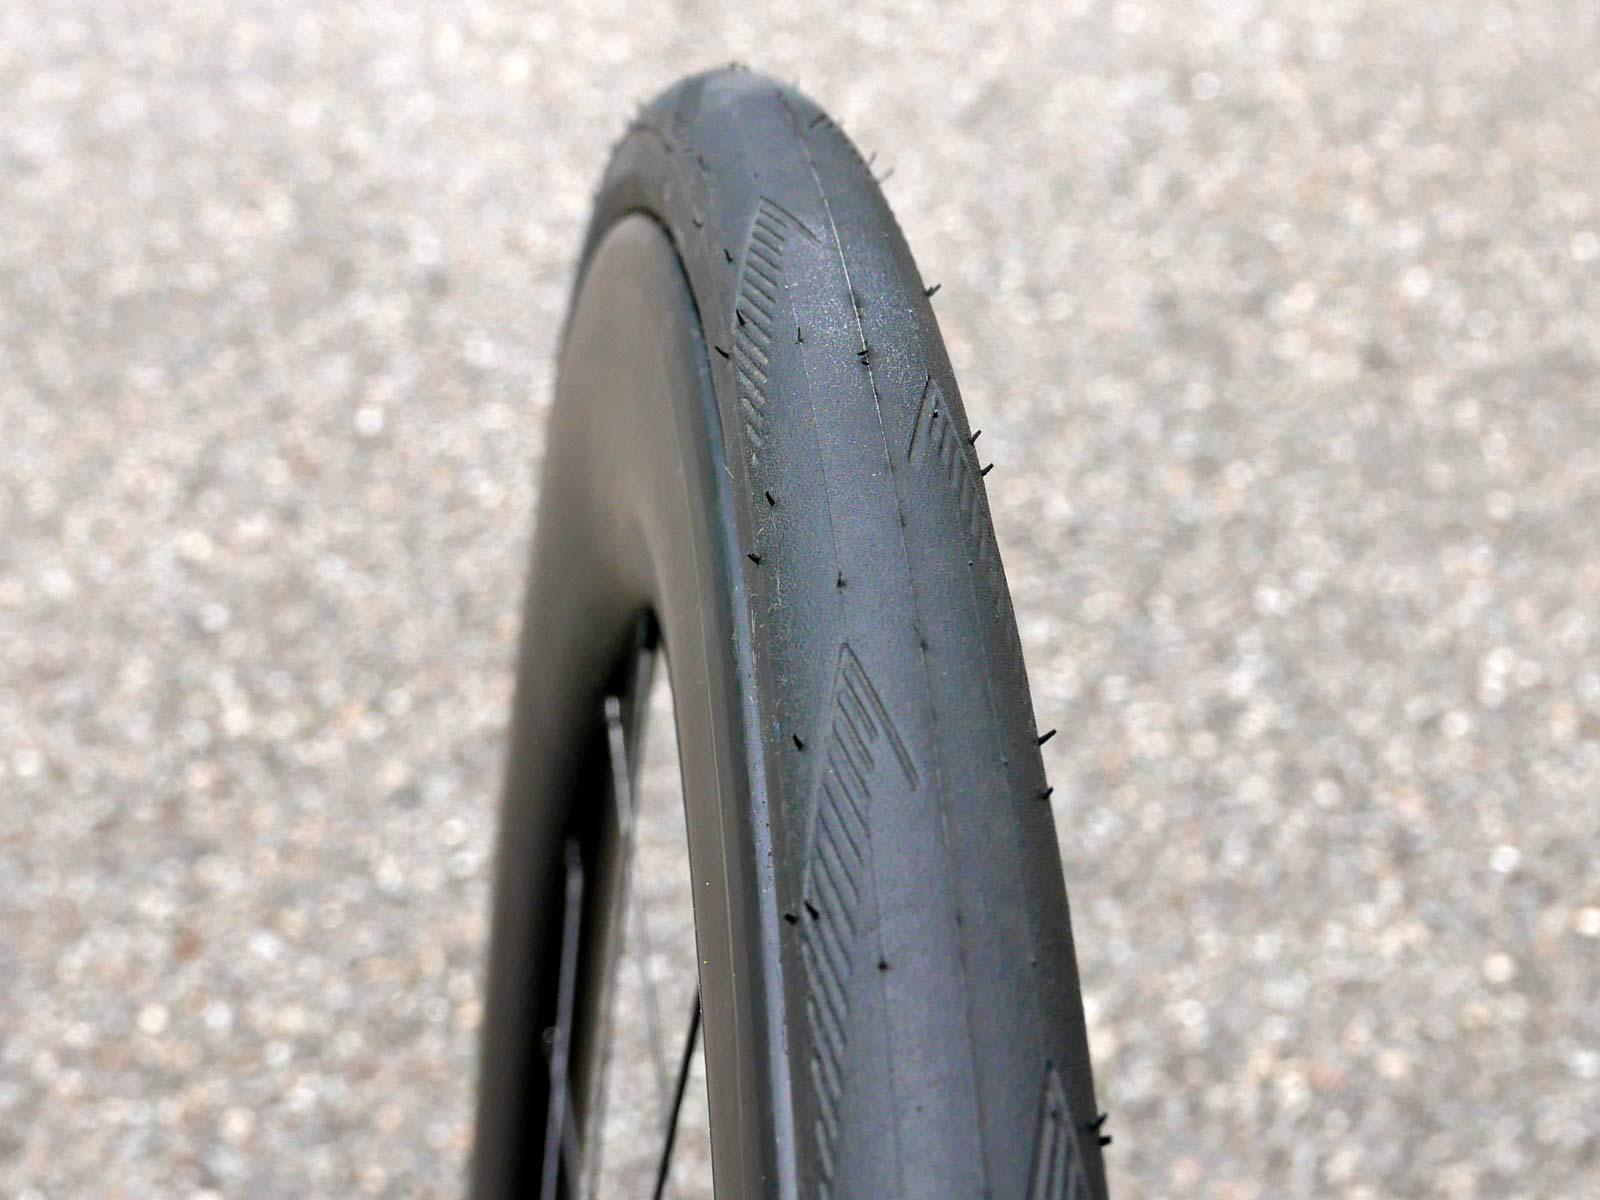 Hunt-Super-Wide-Carbon-Aero-Disc-all-road-wheels_wider-rim-profile.jpg